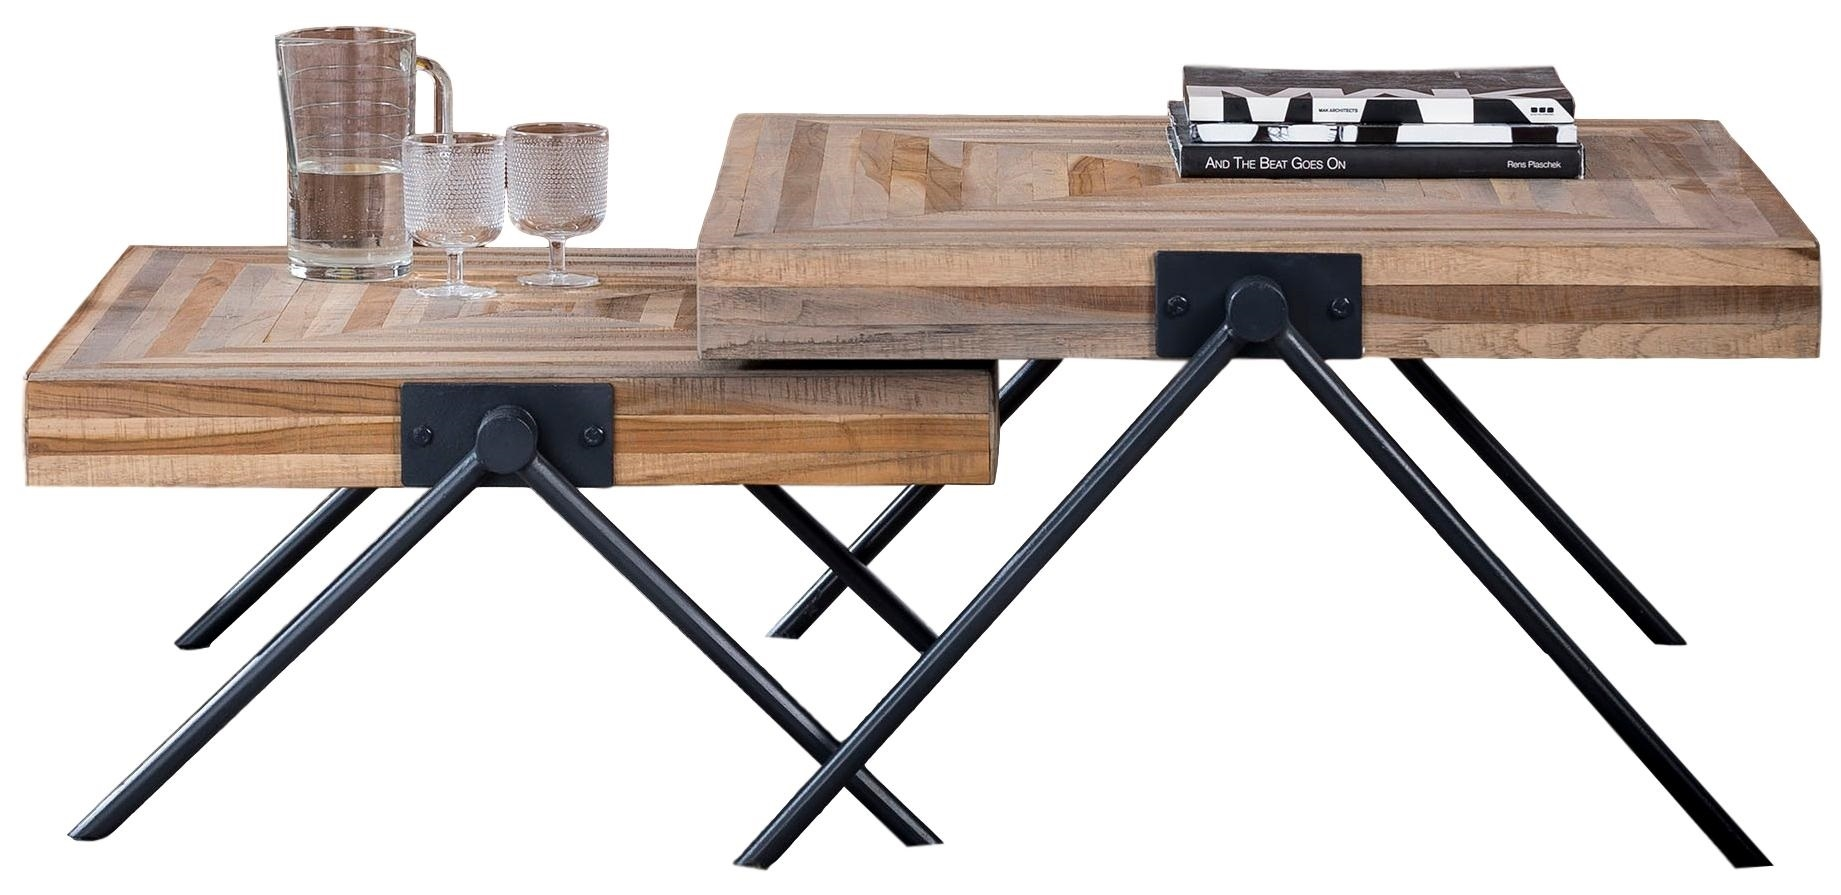 Vierkante salontafel Set Bella 33 en 43 cm hoog – Teakhout verweerd | Zaloni